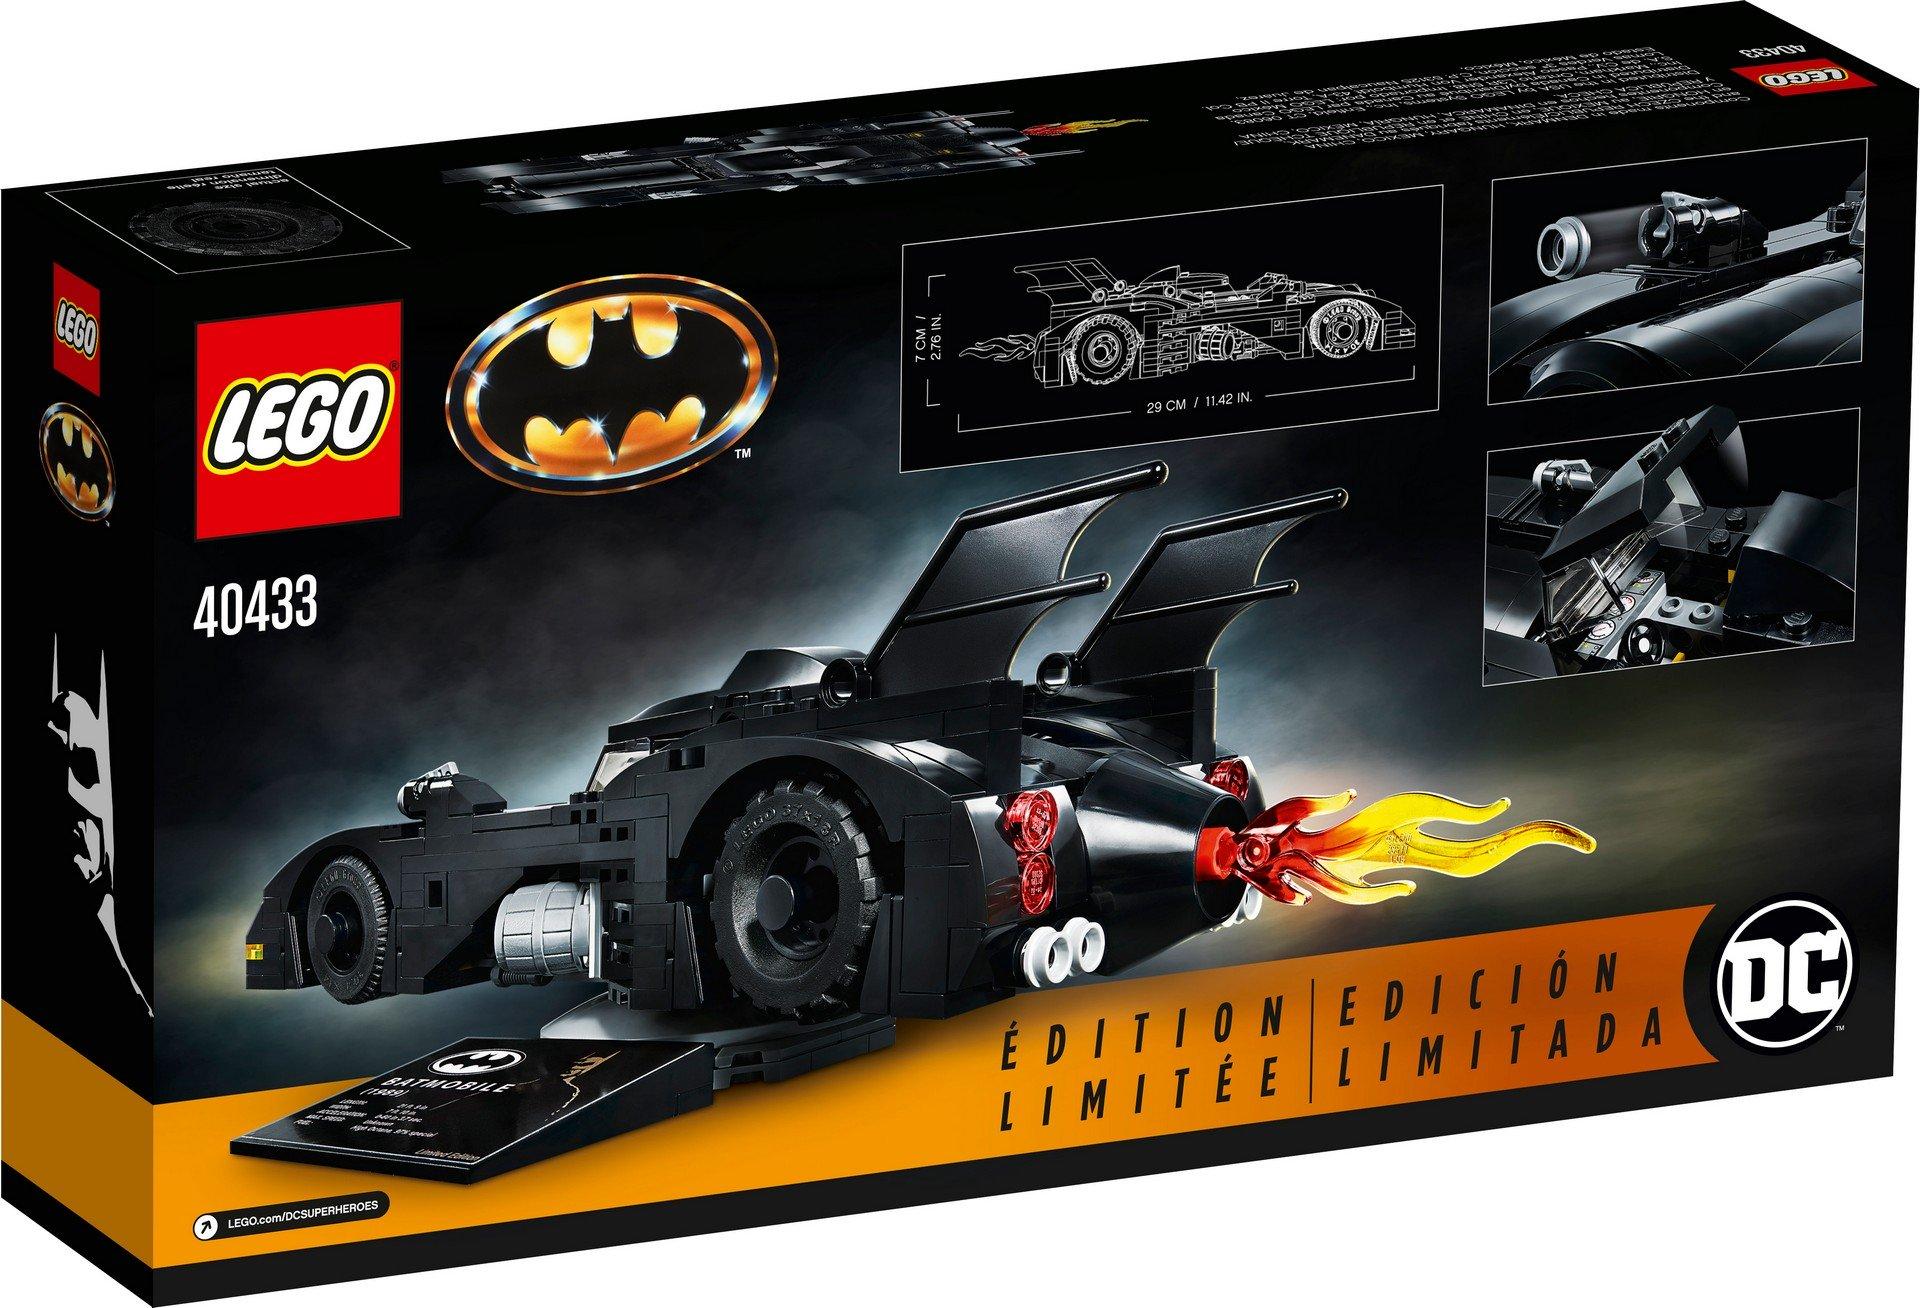 Lego-Batmobile-kit-1989-15